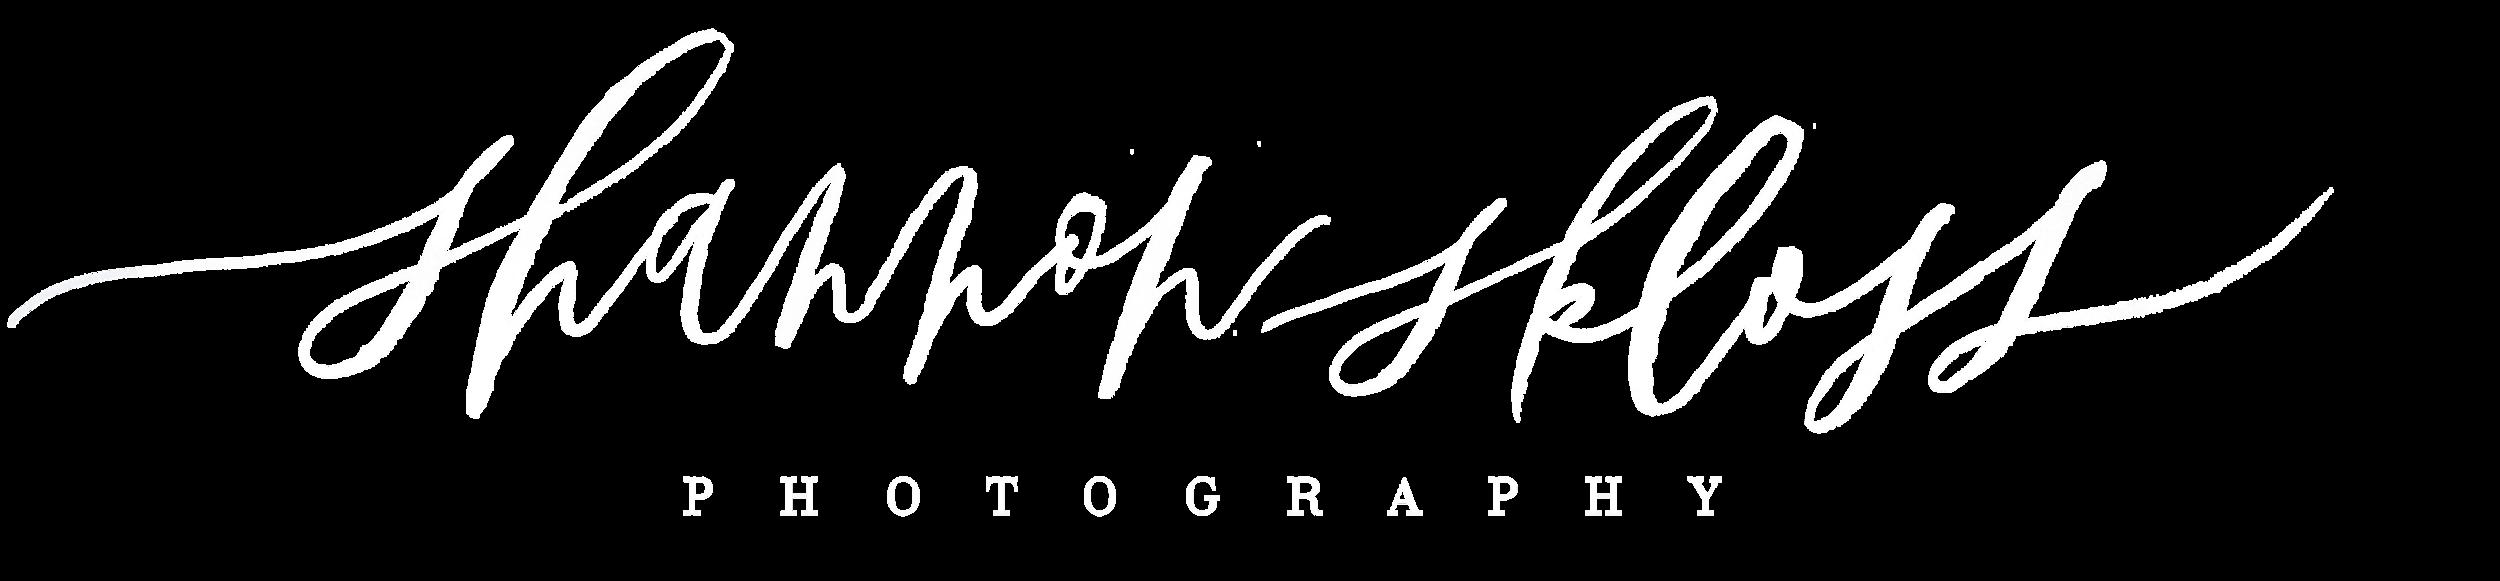 shannon-skloss-logo-proof-3-REV copy.png